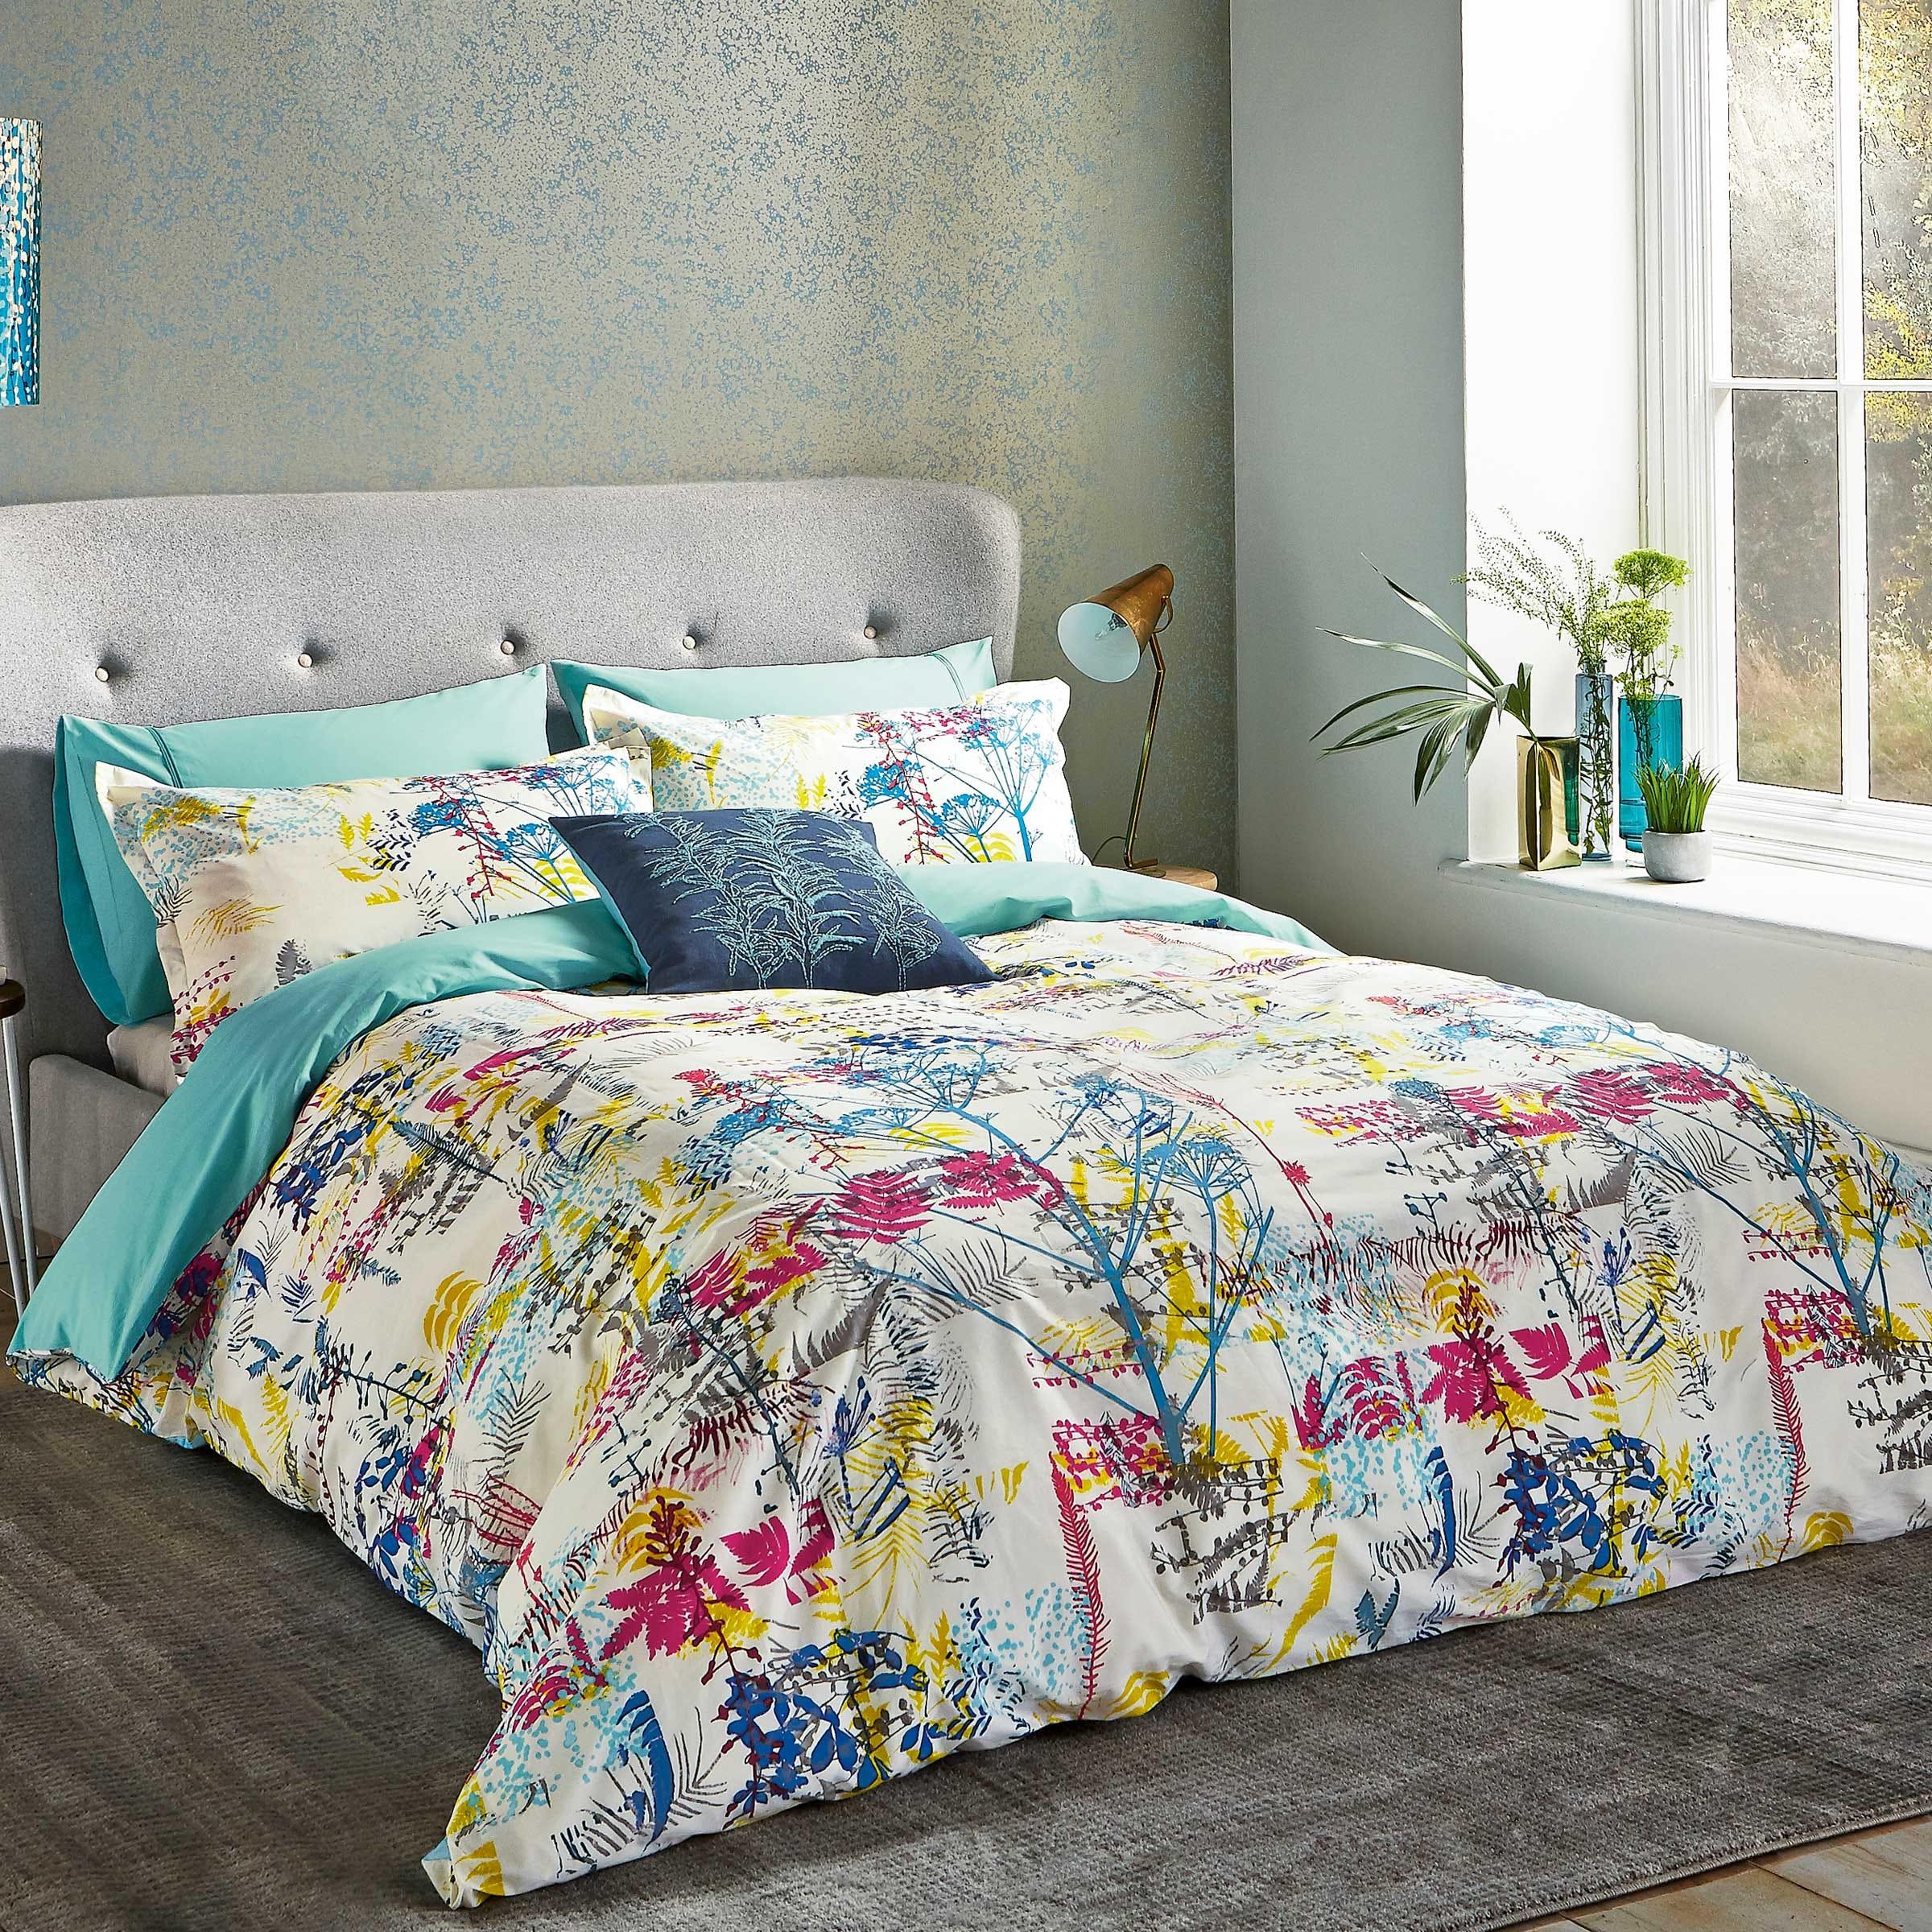 Clarissa Hulse Bedding Backing Cloth Double Duvet Cover Multi Coloured